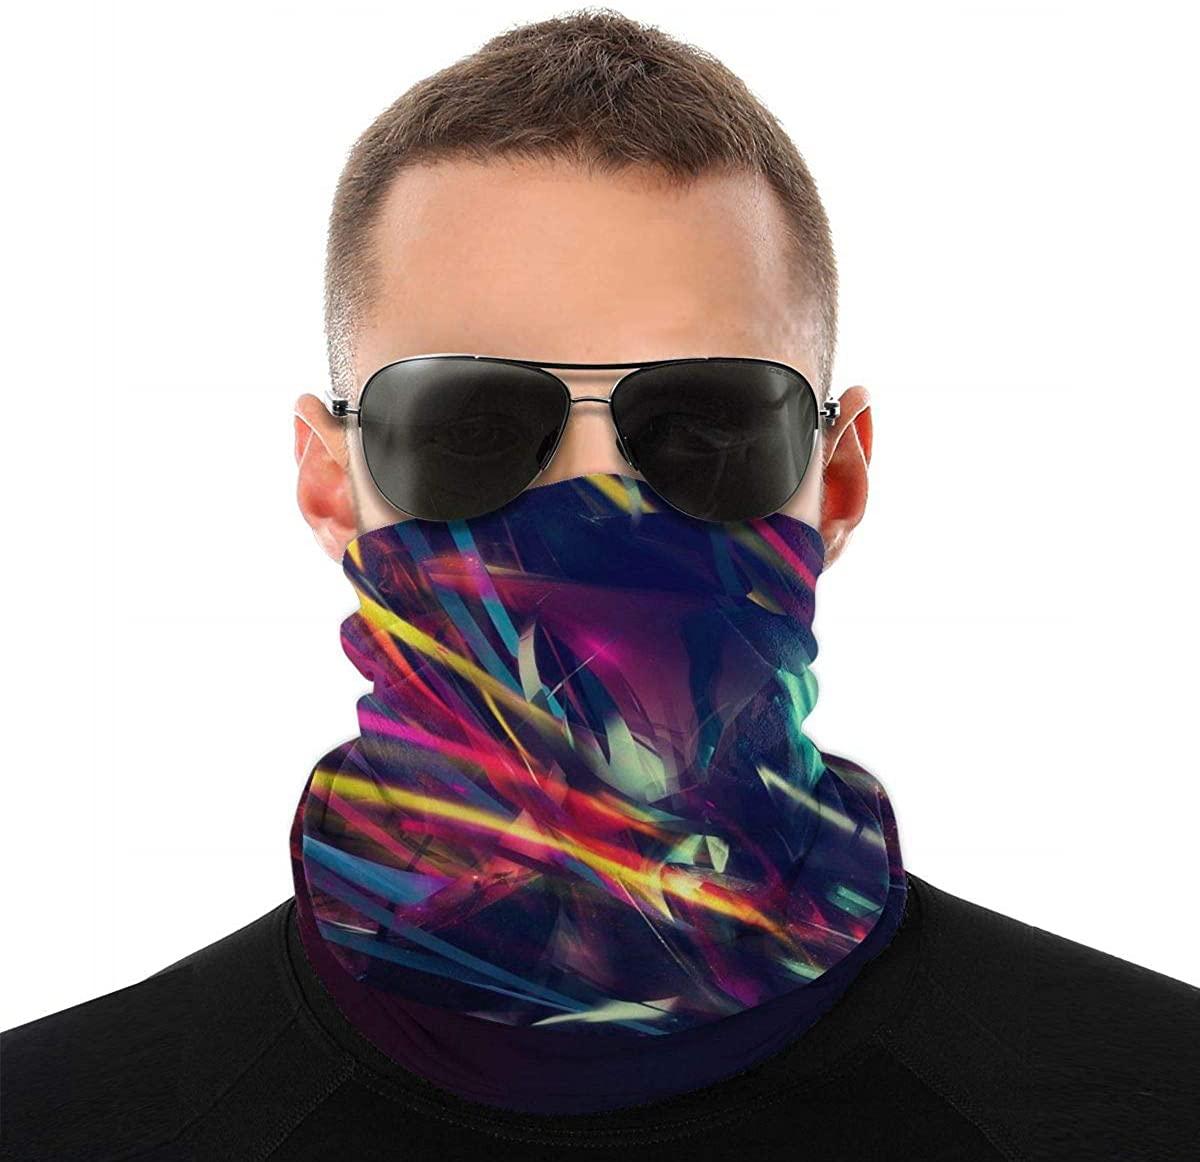 Magic Scarf Elastic Headband Multi-Purpose Headwear Bandanas Sun UV dust and wind Protection Colorful Neck Gaiter for Men and Women 3 Pcs